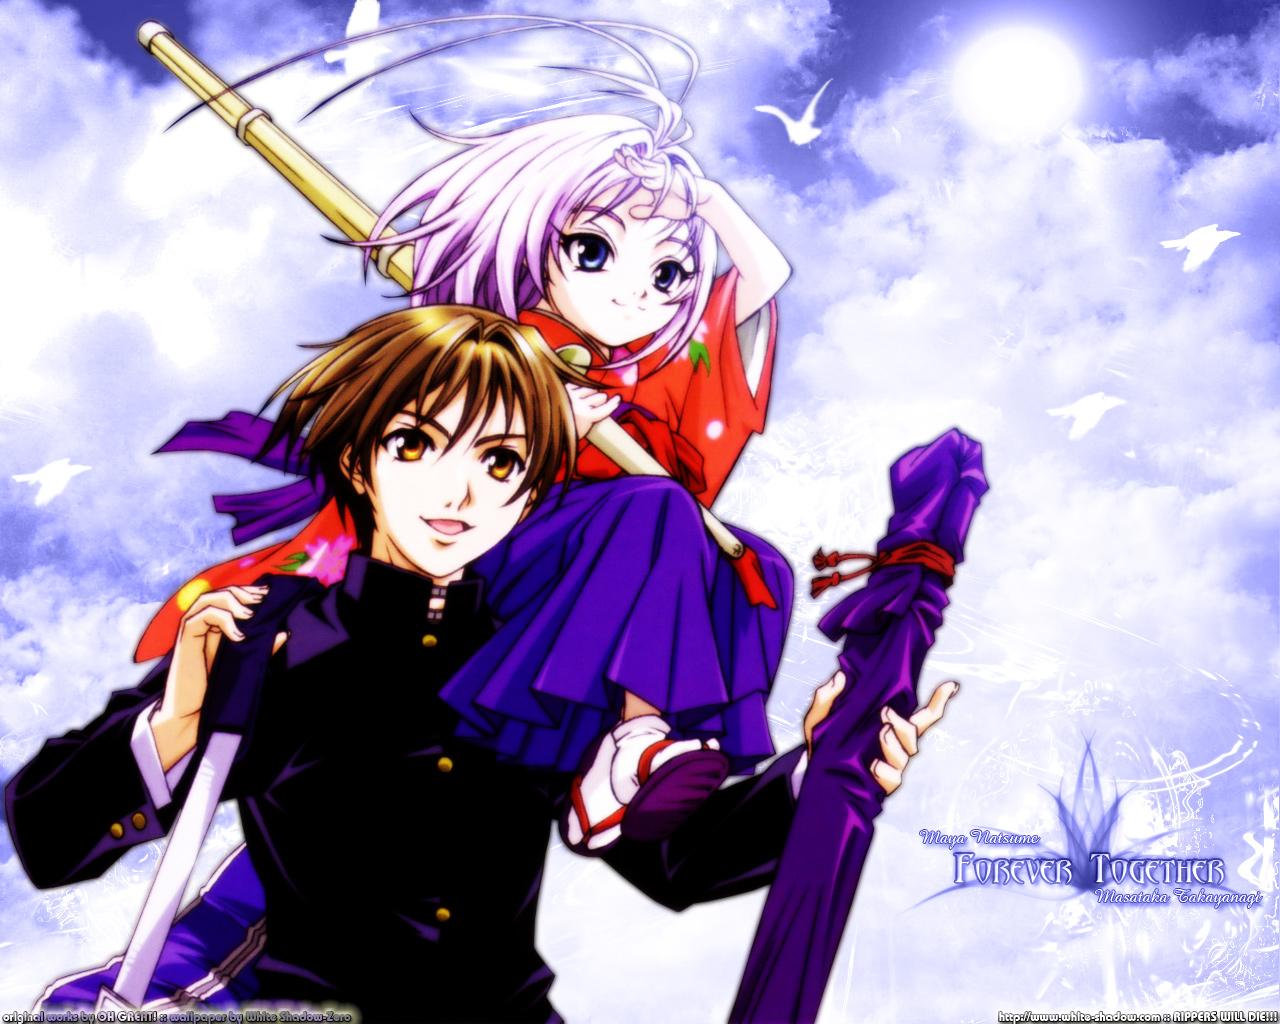 Anime Girl Wallpaper Hd Icon Tenjho Tenge Fighter Anime Wallpaper 02 Imagez Only